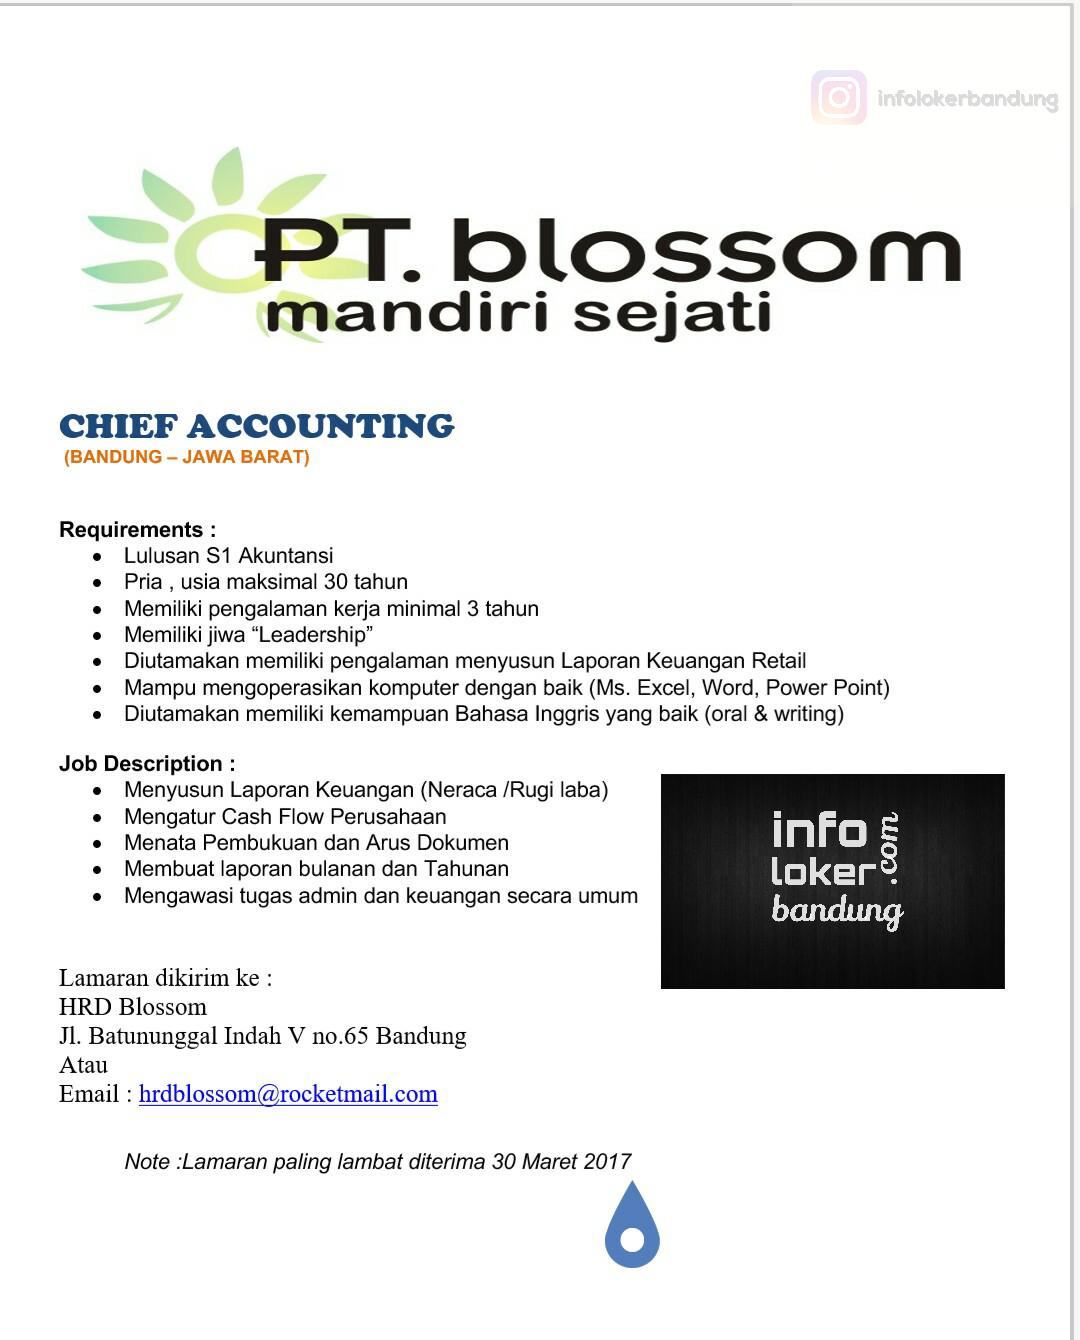 Lowongan Kerja PT. Blossom Mandiri Sejati Maret 2017